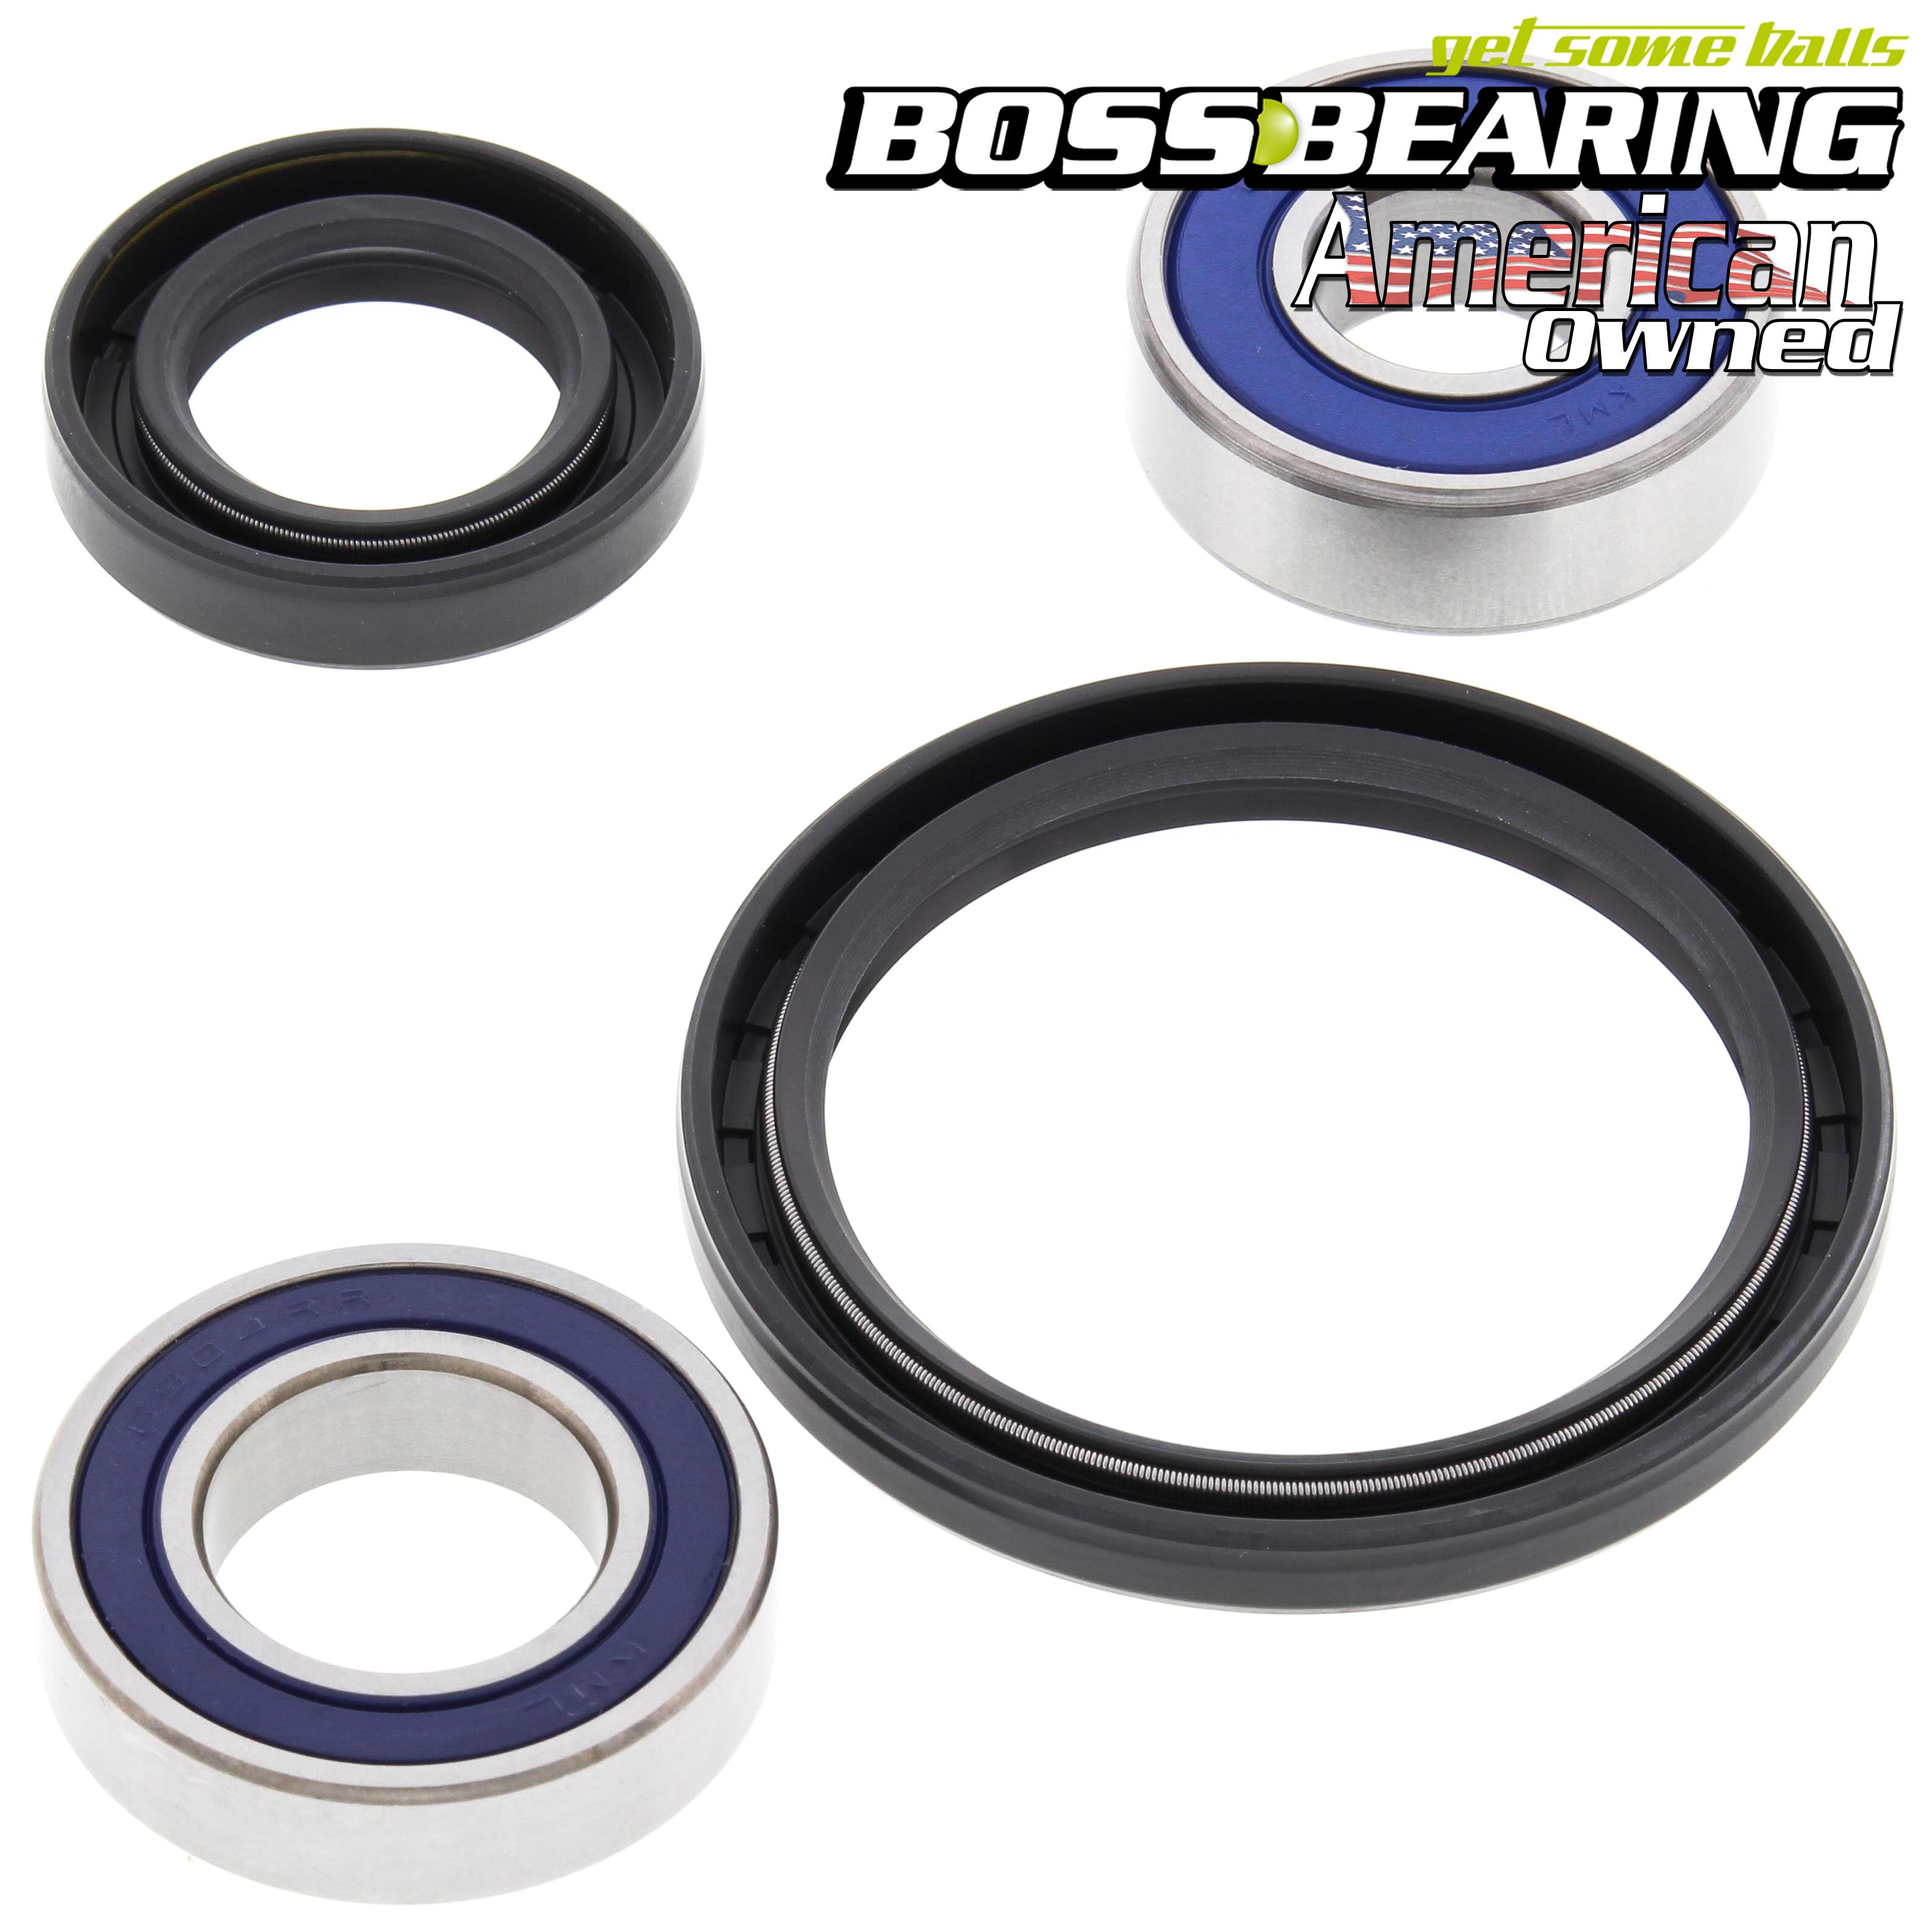 Both Front Wheel Bearing Seal Kits for 95-98 Yamaha YFB250 Timberwolf 250 2x4